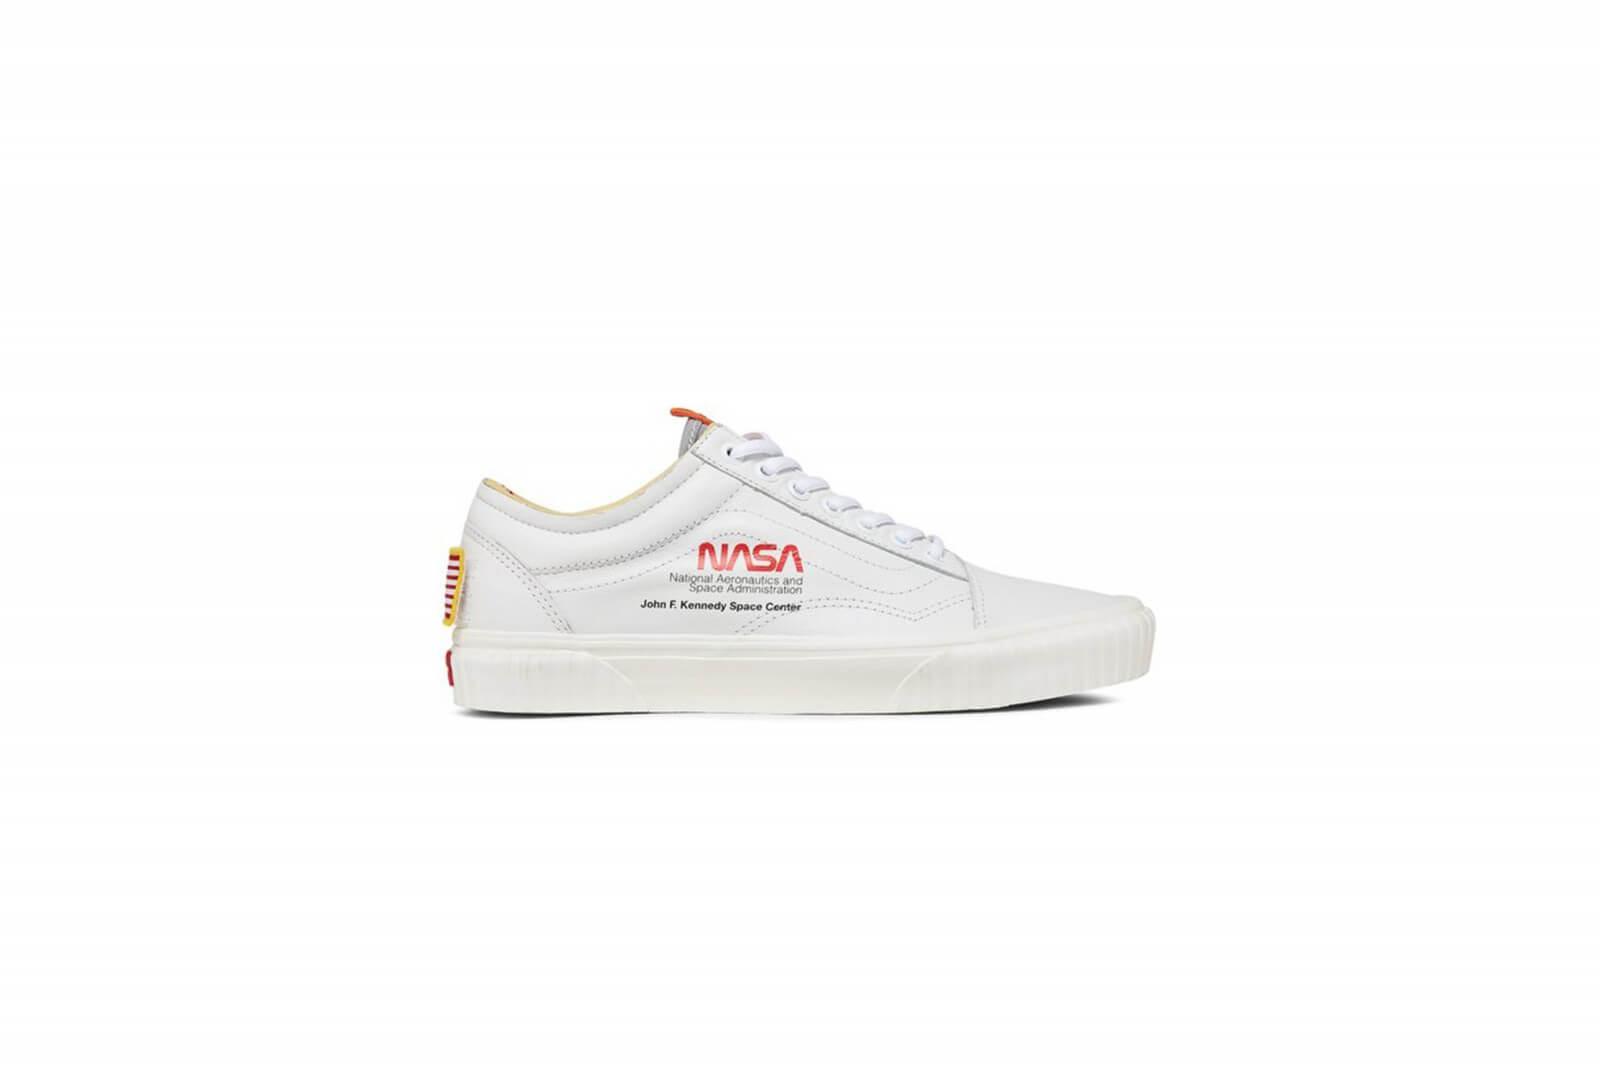 611e488c14 Vans Nasa Old Skool X Space Vn0a38g1up91 Voyager White rrqw6g